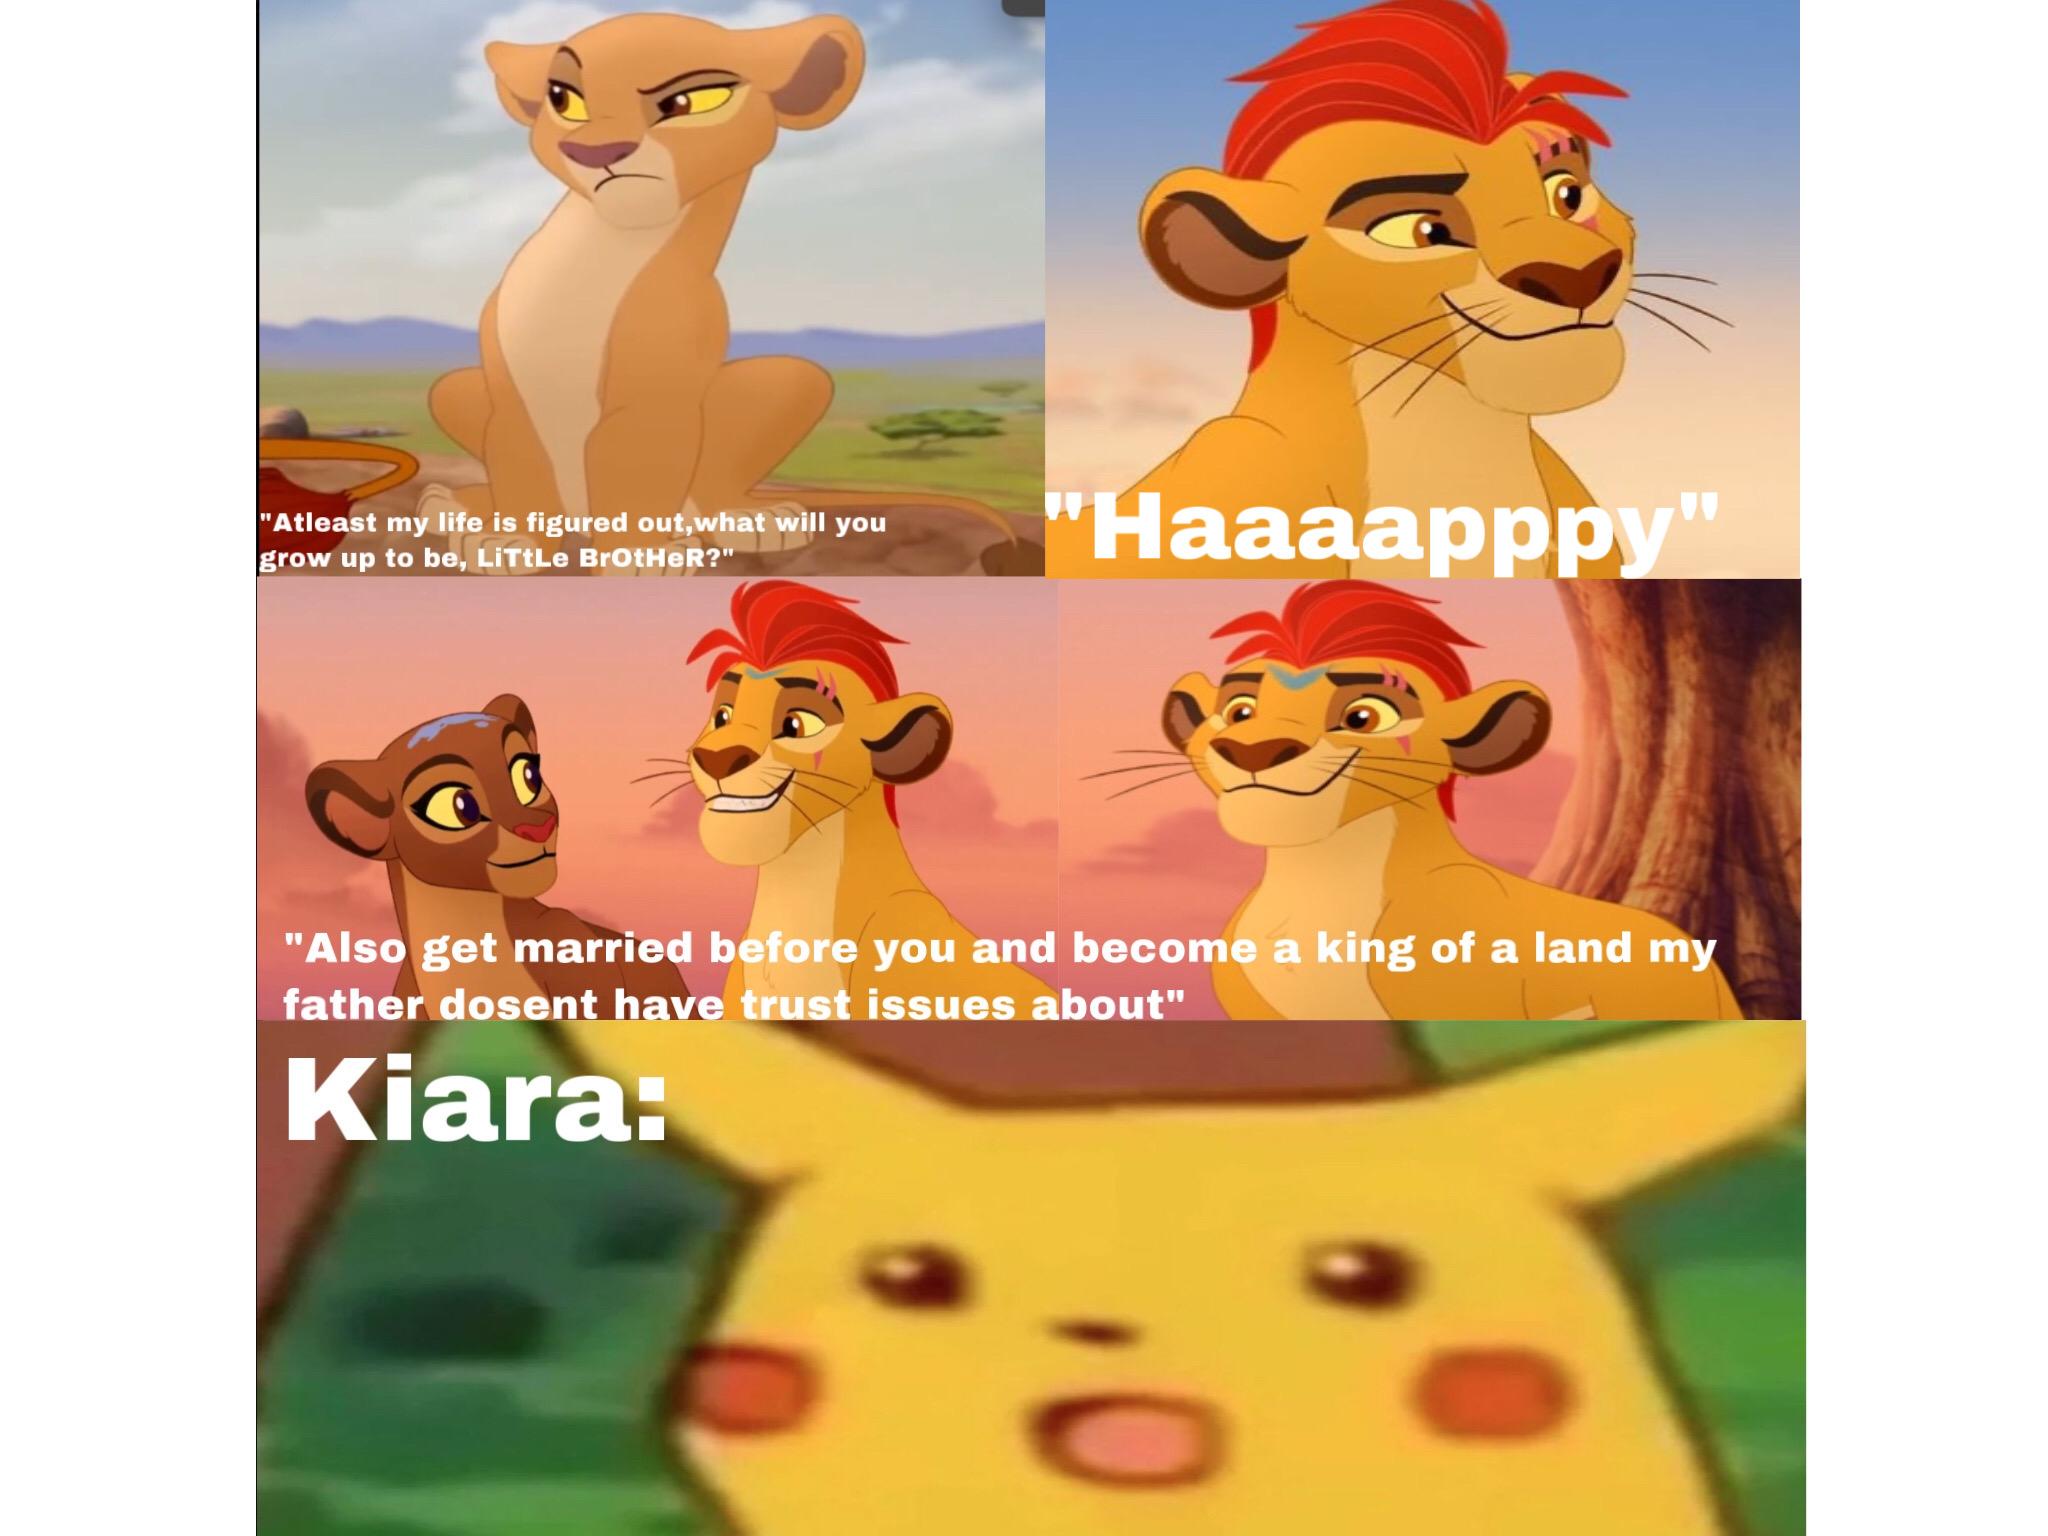 Actual Good Memes Rpwediepie Actual Good You Helped Memes Through